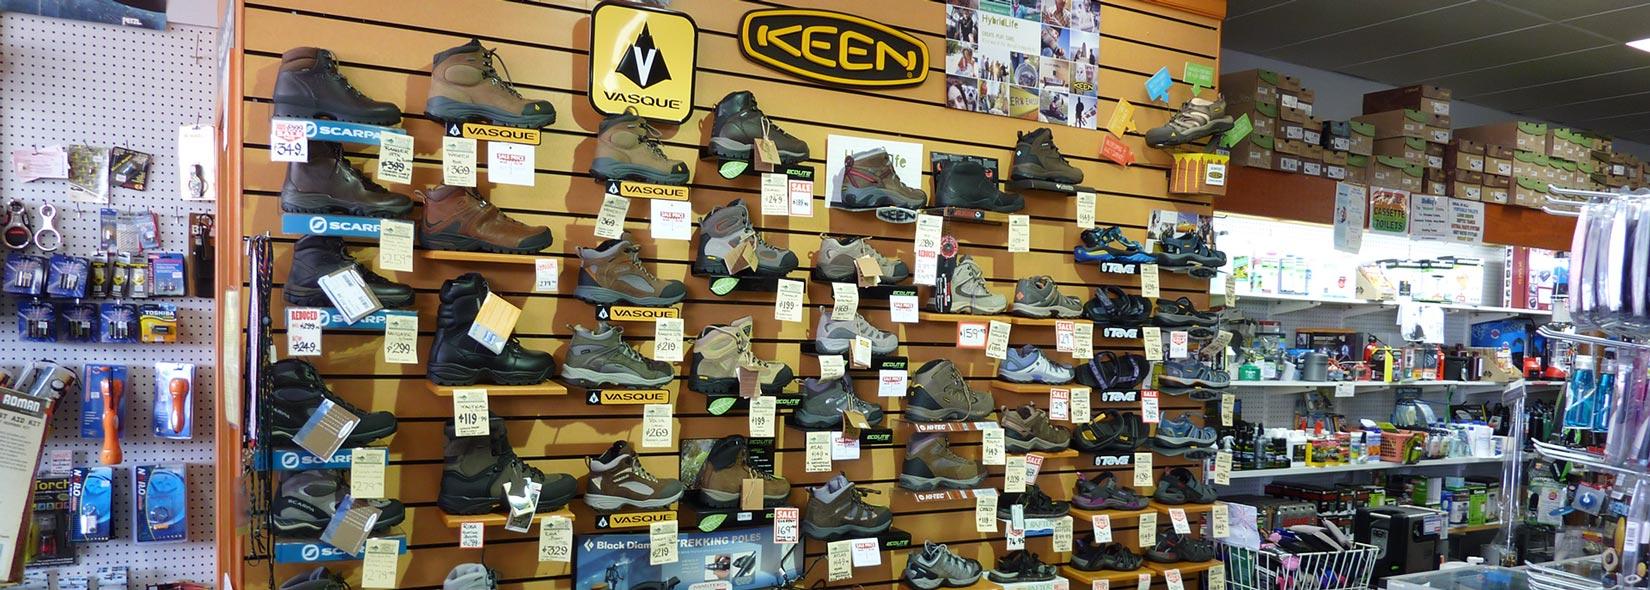 Outdoor Footware, Hiking Boots, Sandals